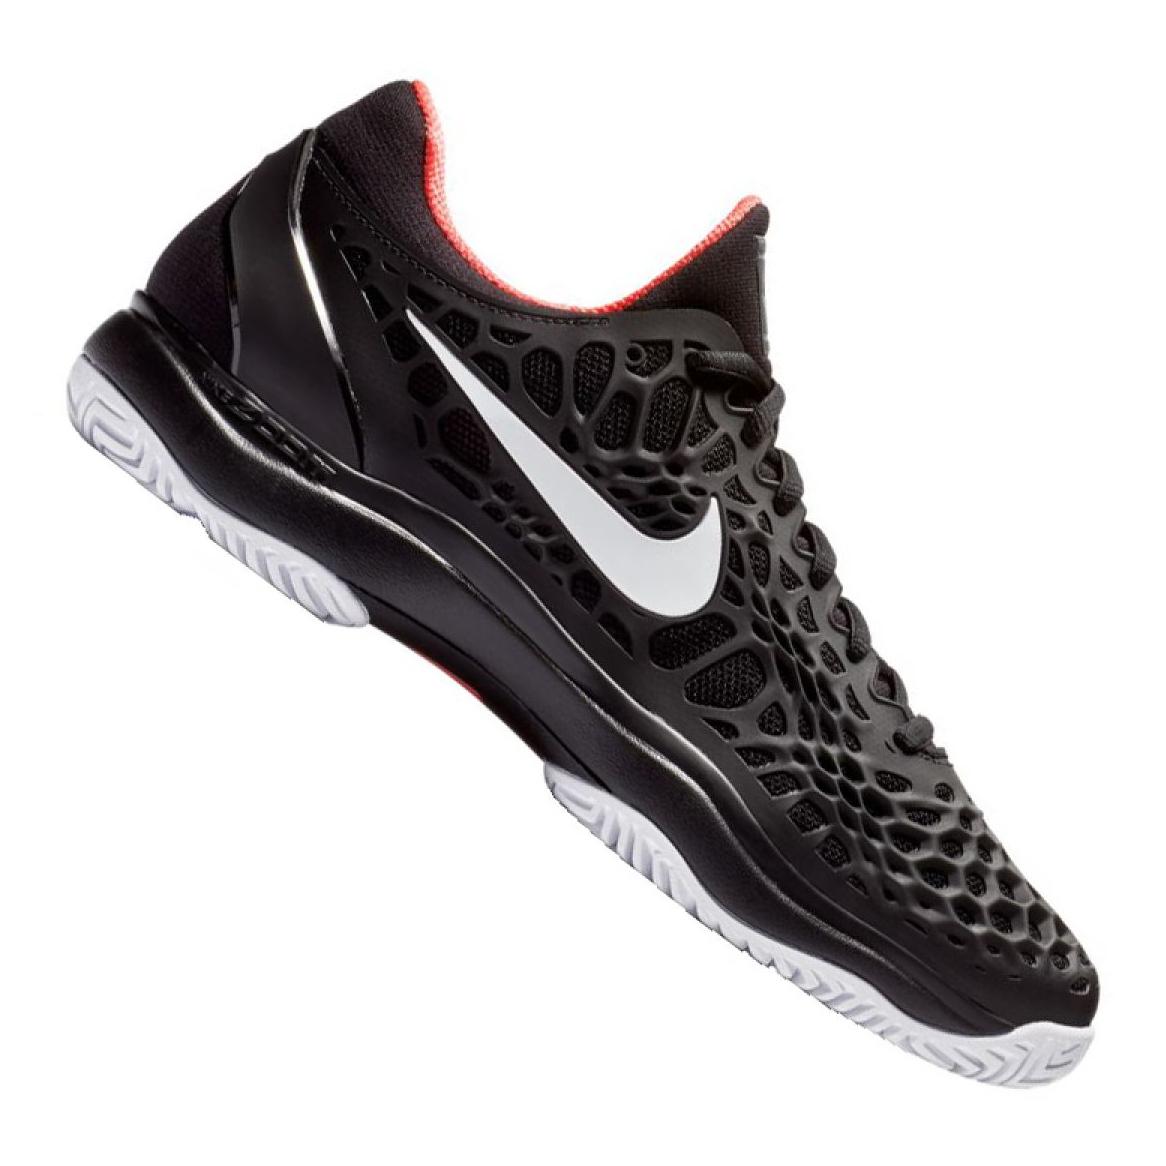 Ofertas Zapatillas Tenis Nike Mujer Nike Zoom Cage 3